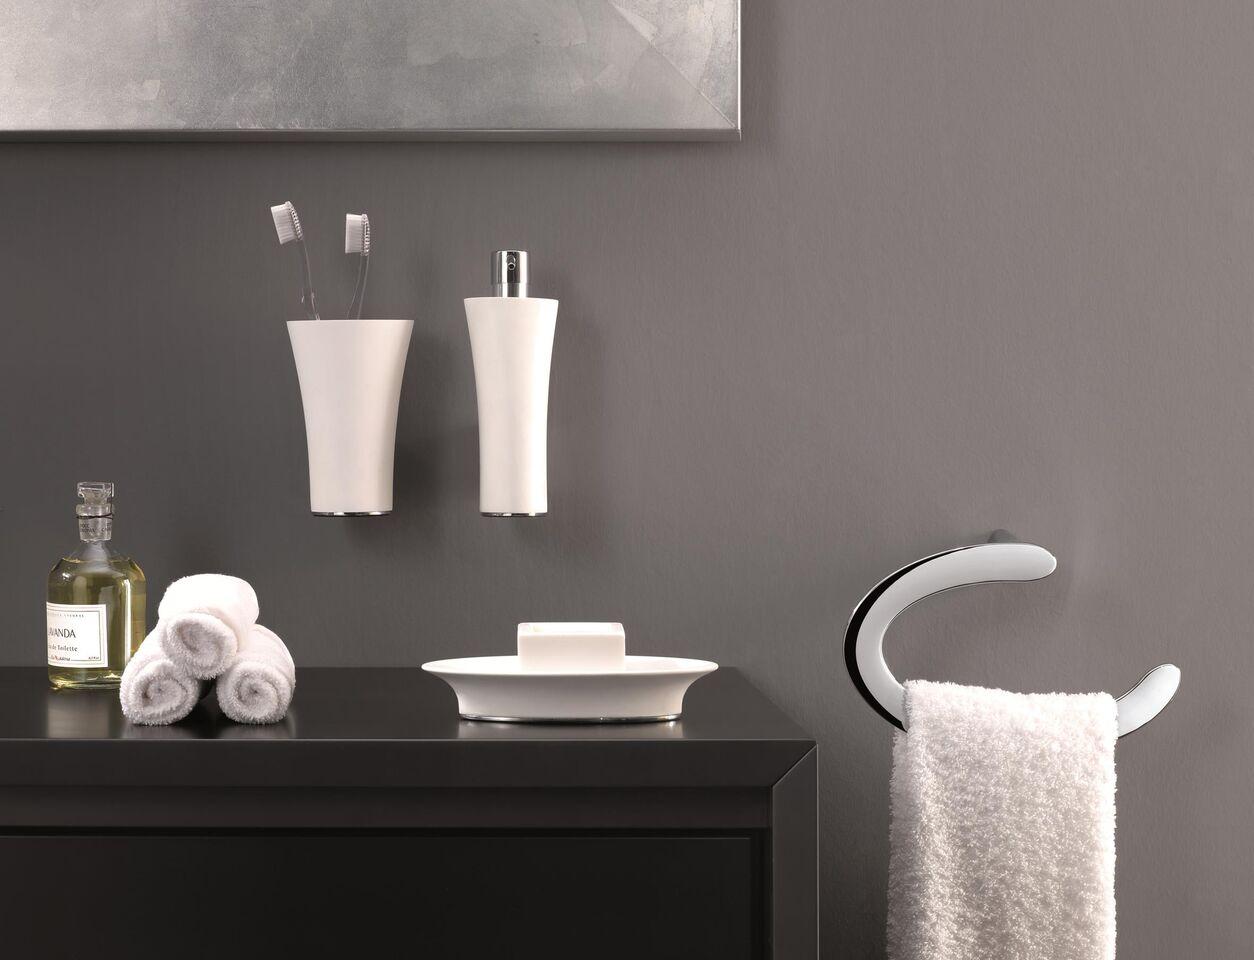 Ideas For Choosing Innovative Bathroom Accessories Frp Manufacturer